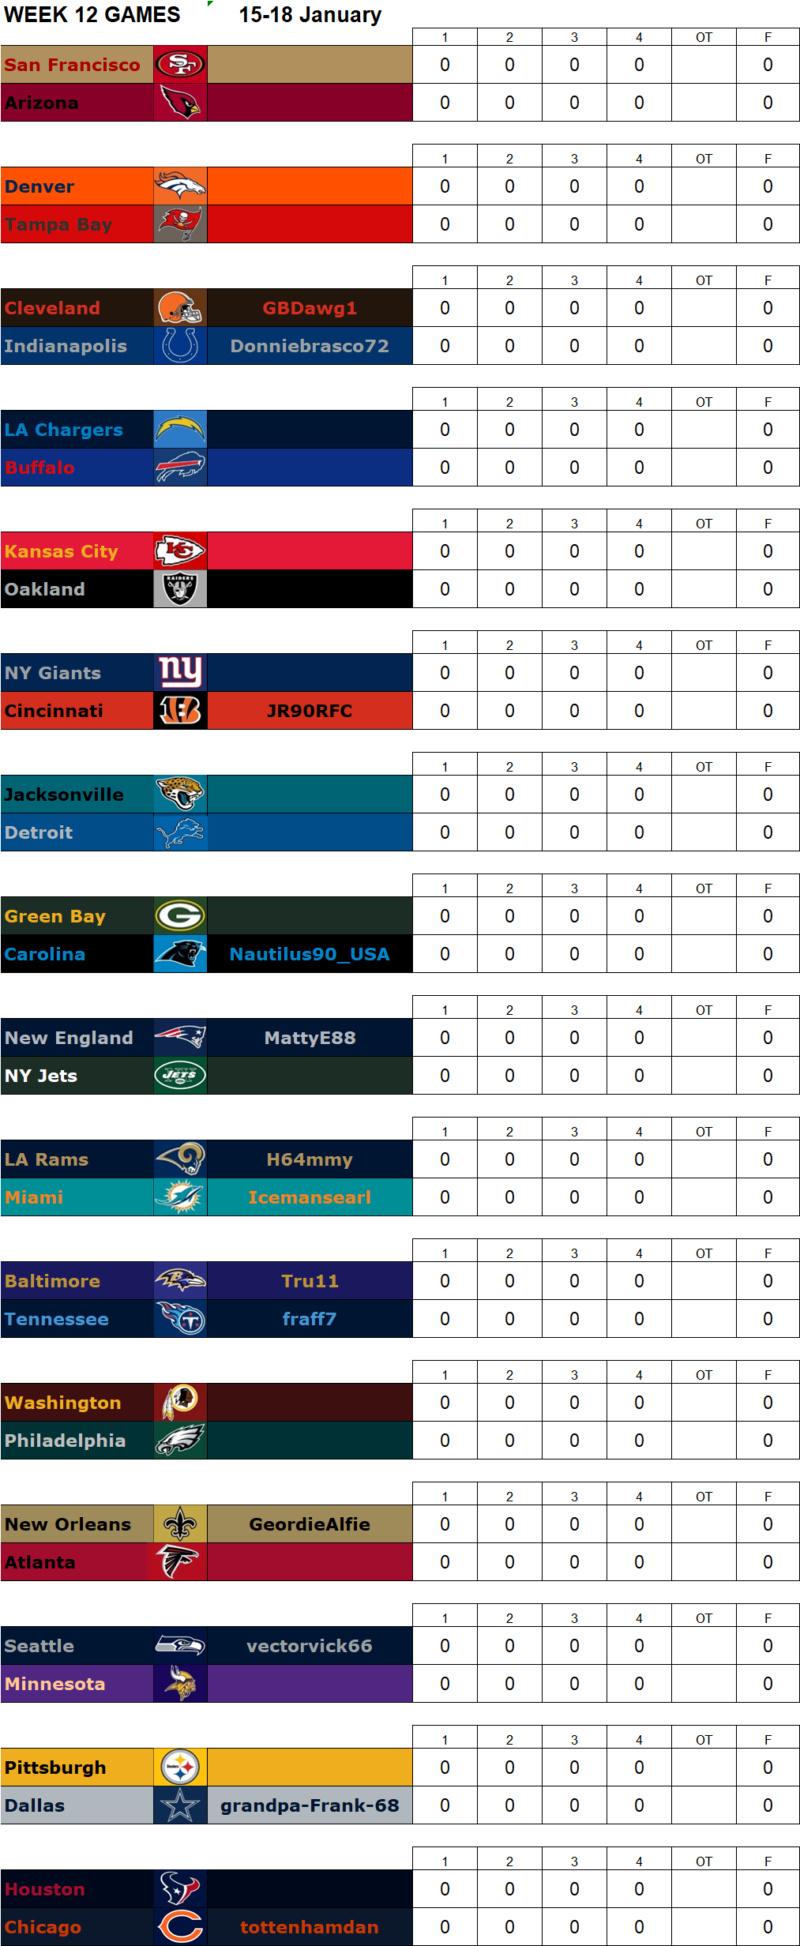 Week 12 Matchups, 15-18 January W12g20